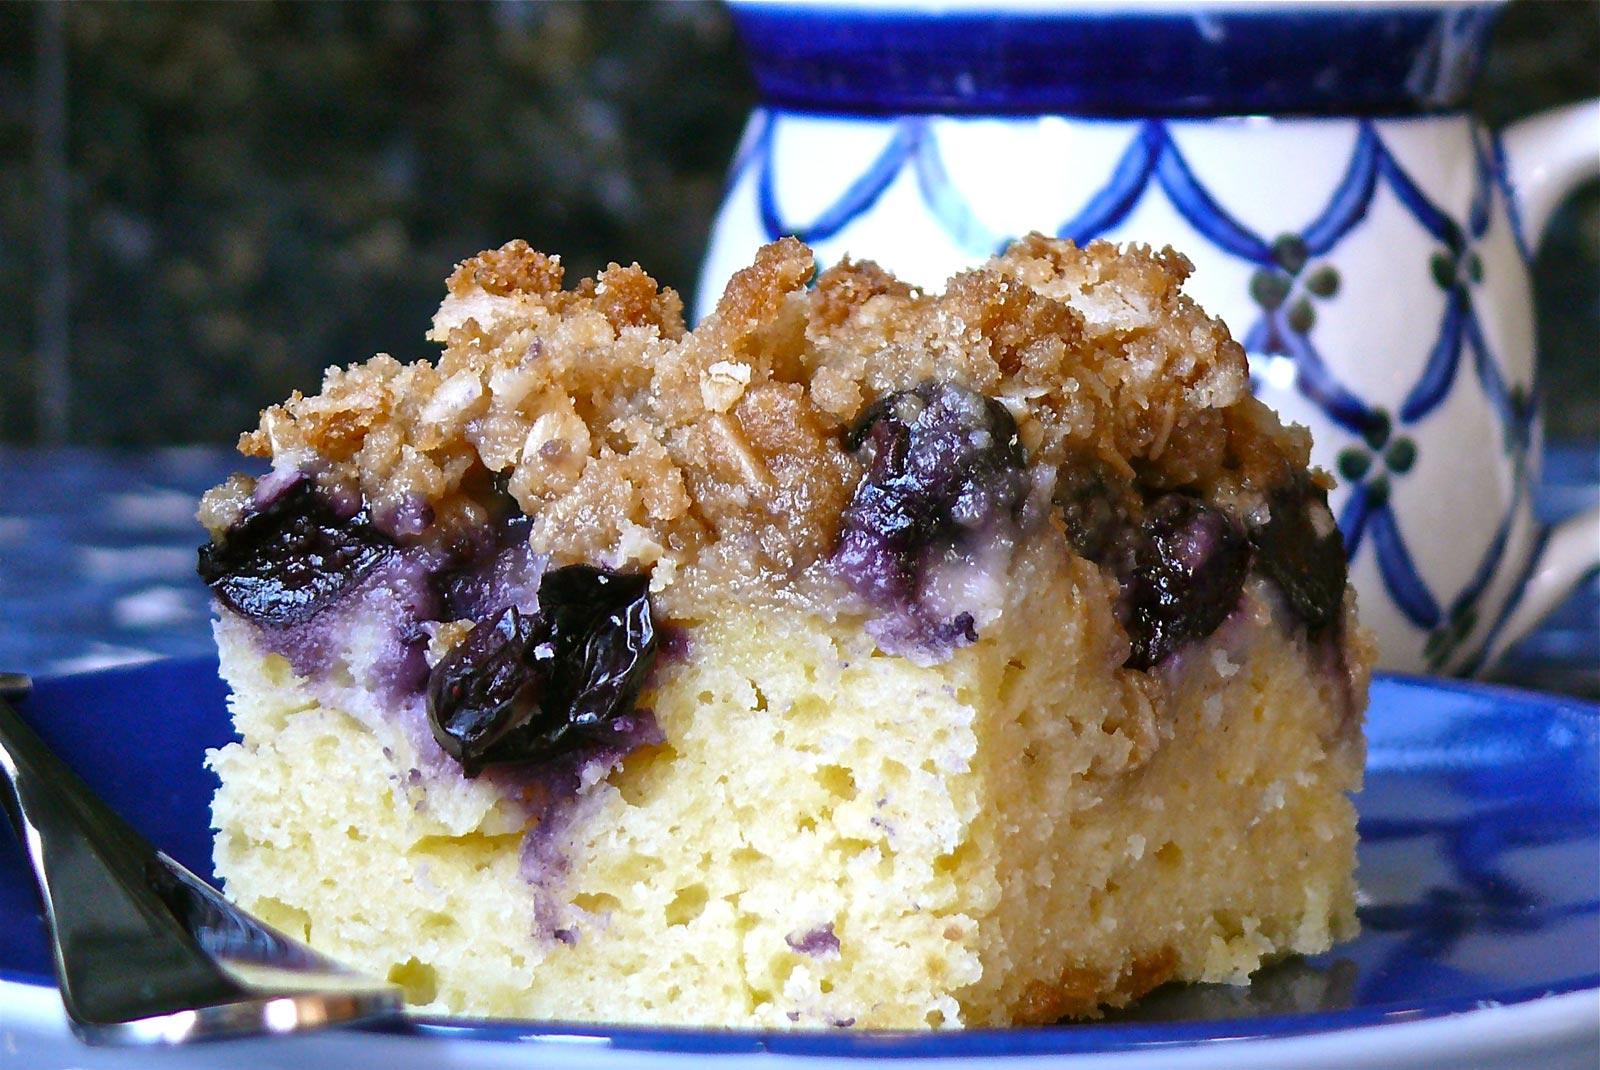 Taste Of Home Blueberry Sour Cream Coffee Cake Recipe